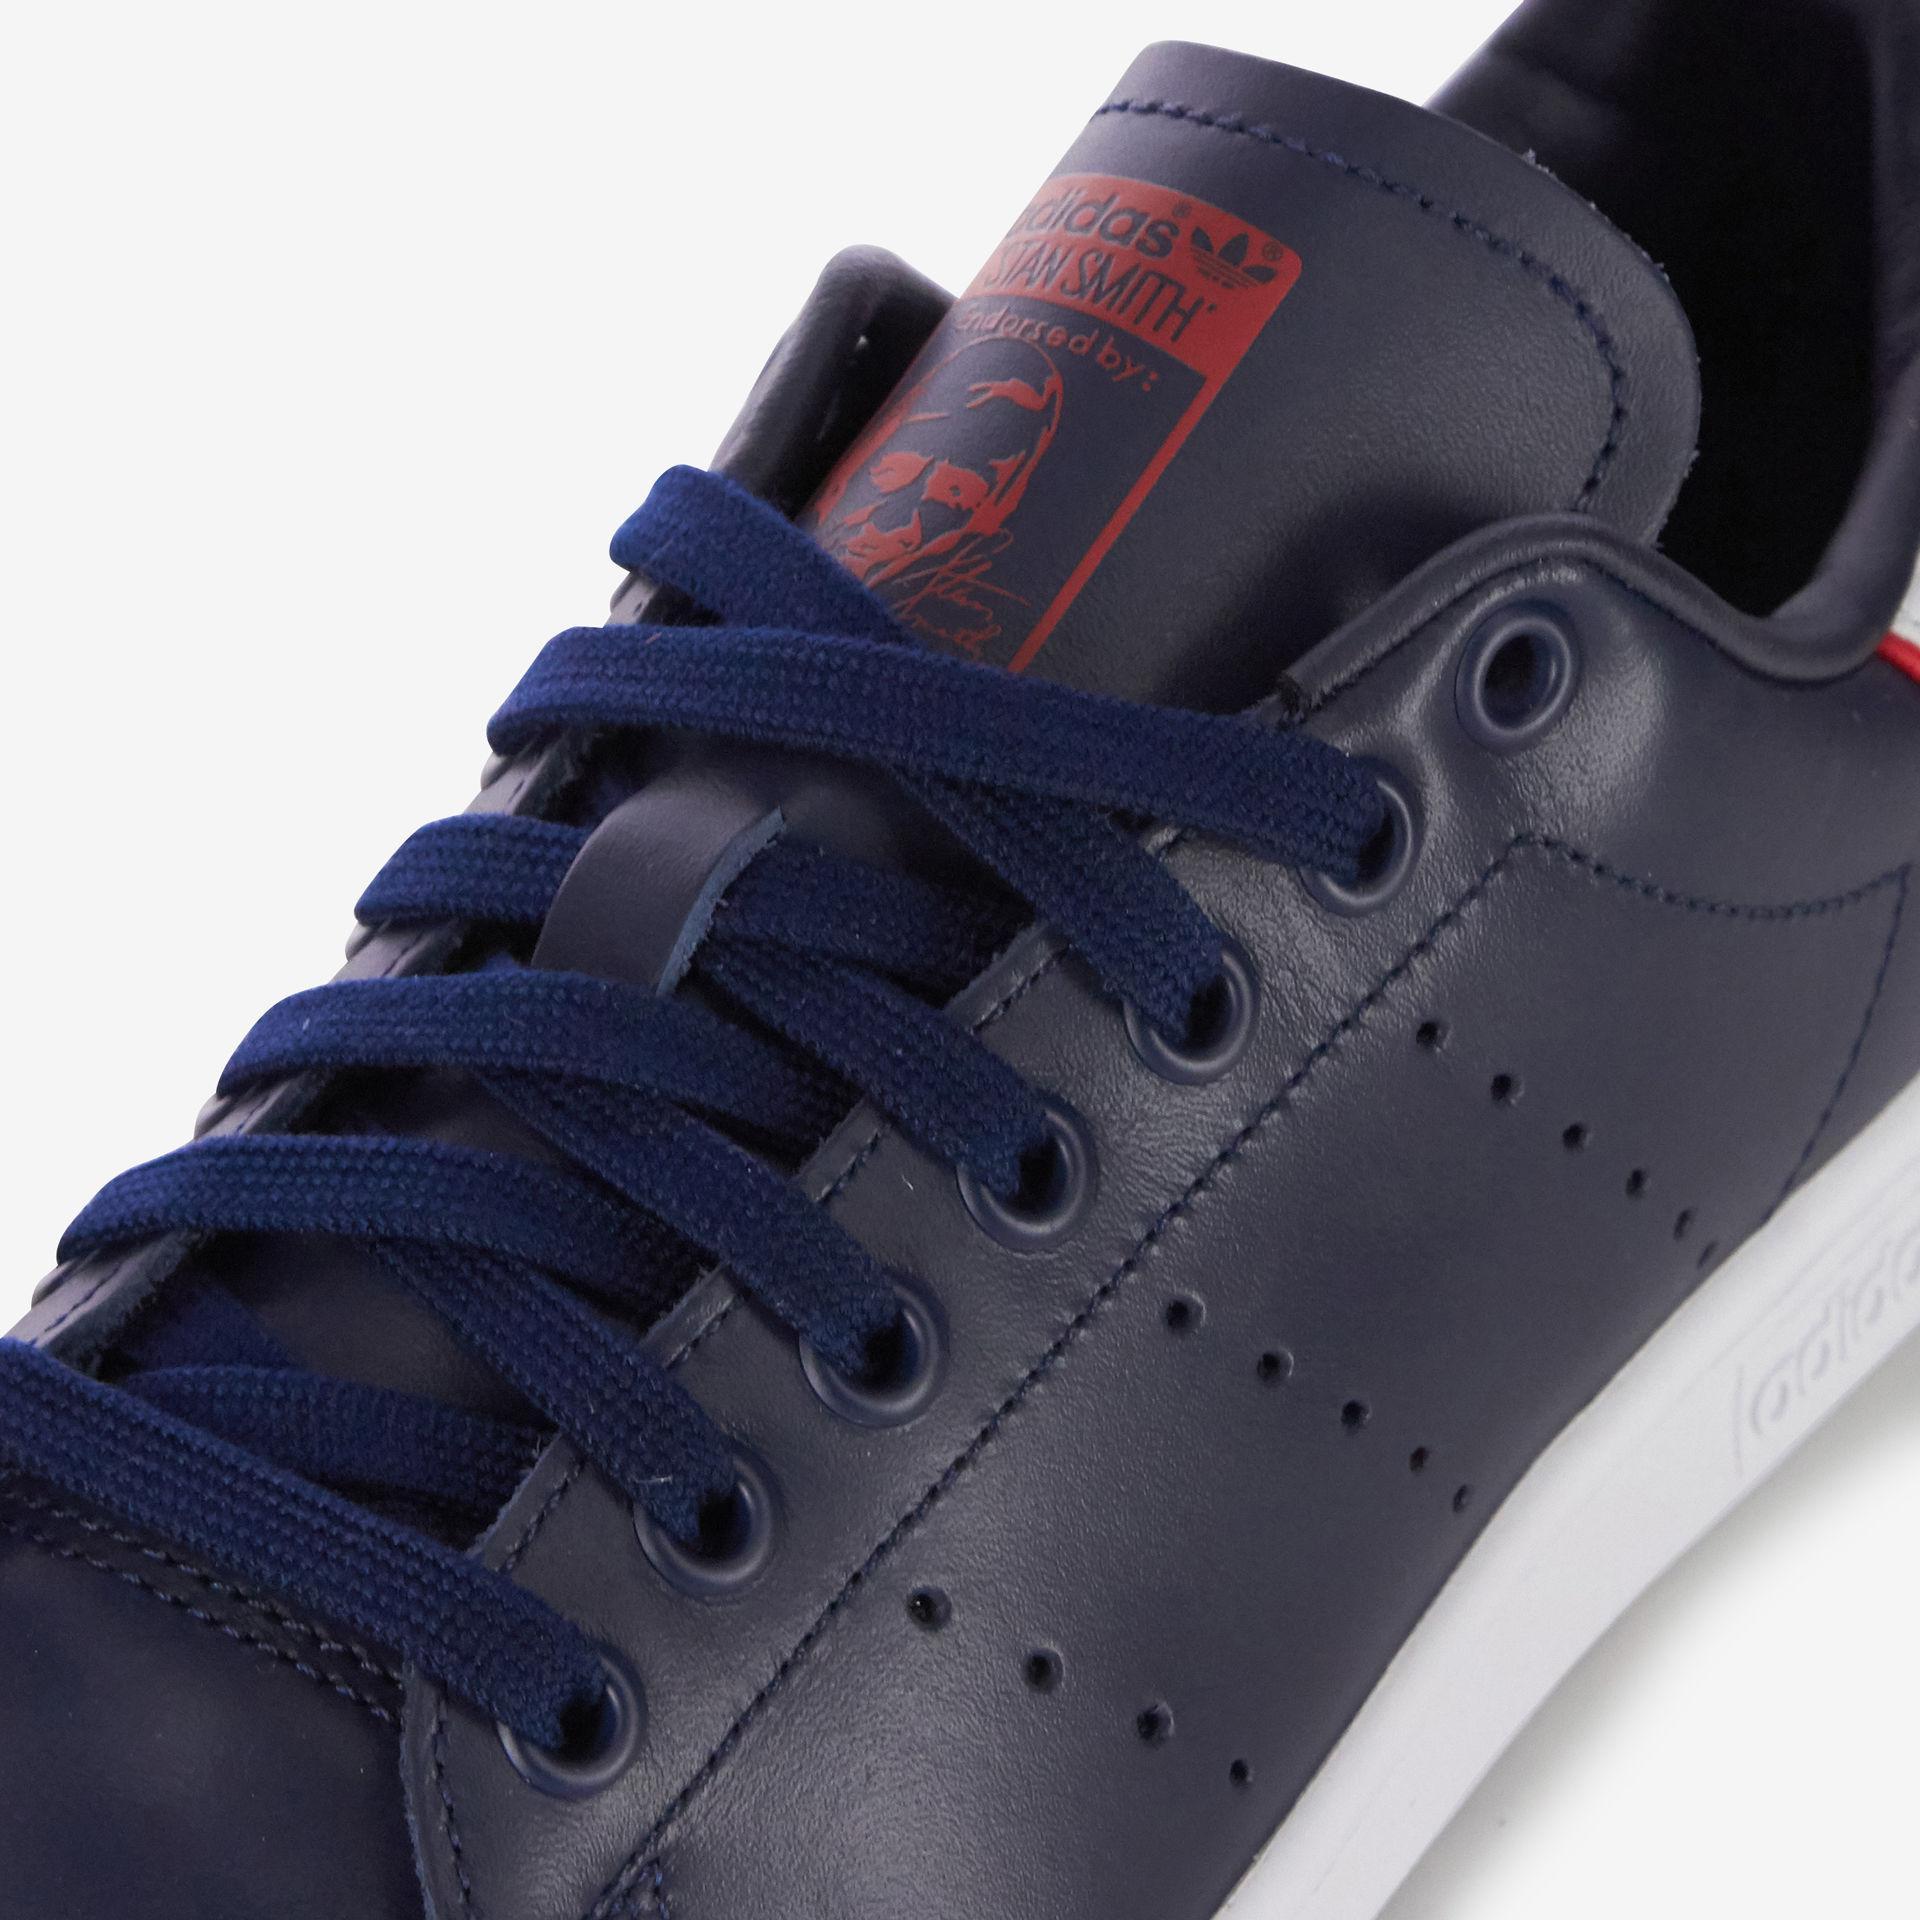 low priced 5dd69 aff6b Lyst - Stan smith signature adidas Originals en coloris Bleu